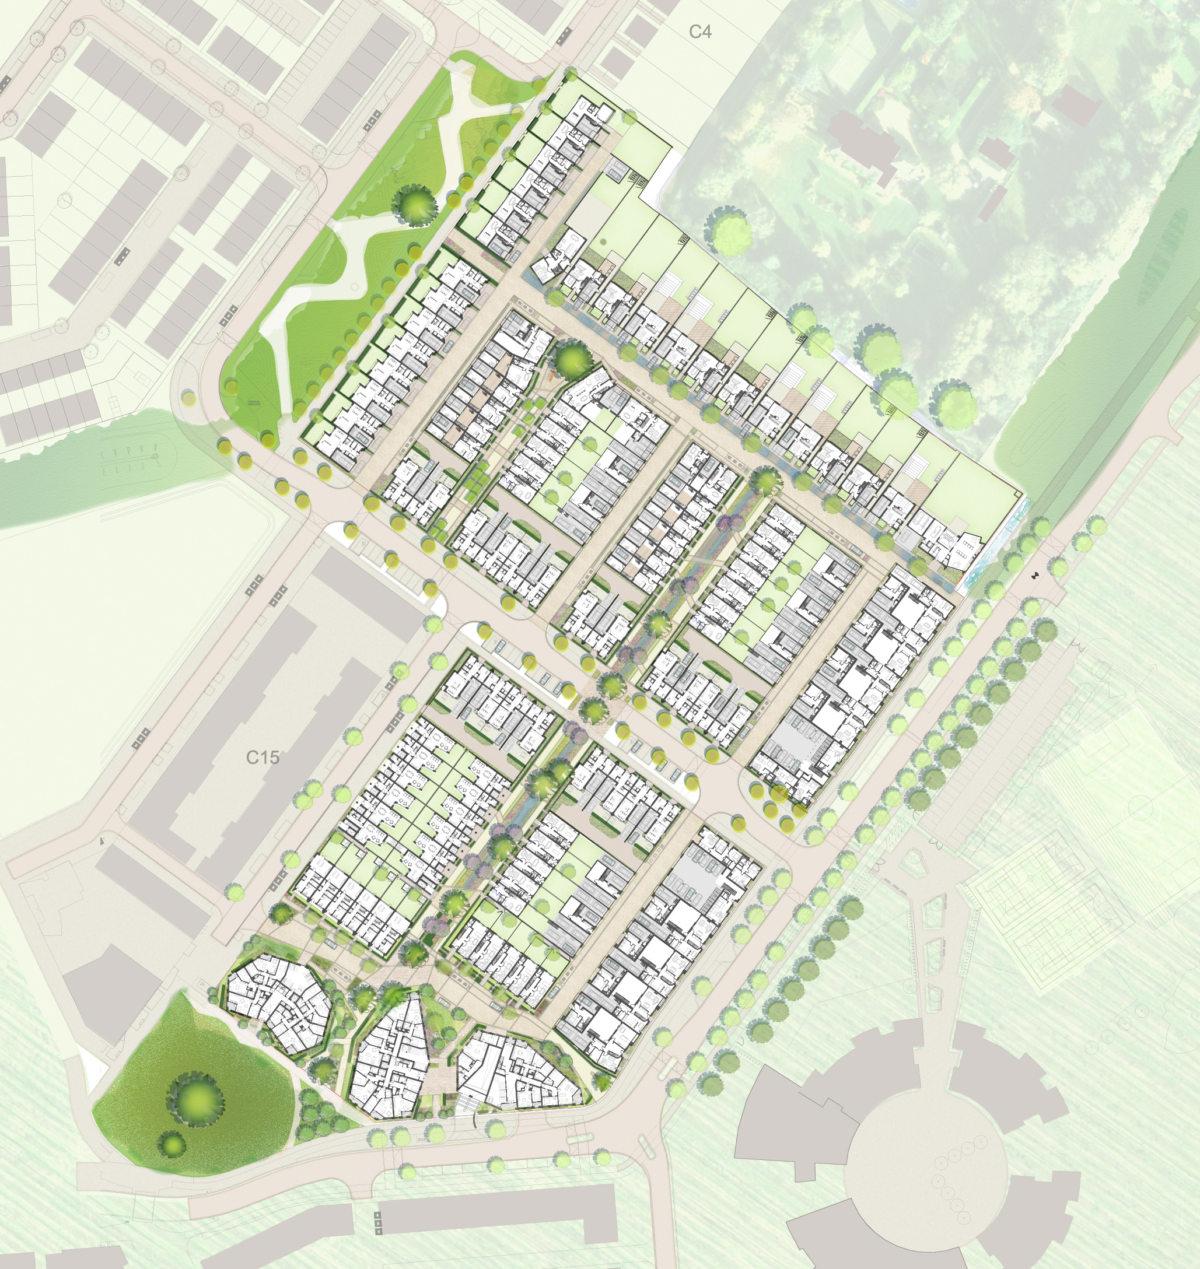 150526_Landscape masterplan 1_500